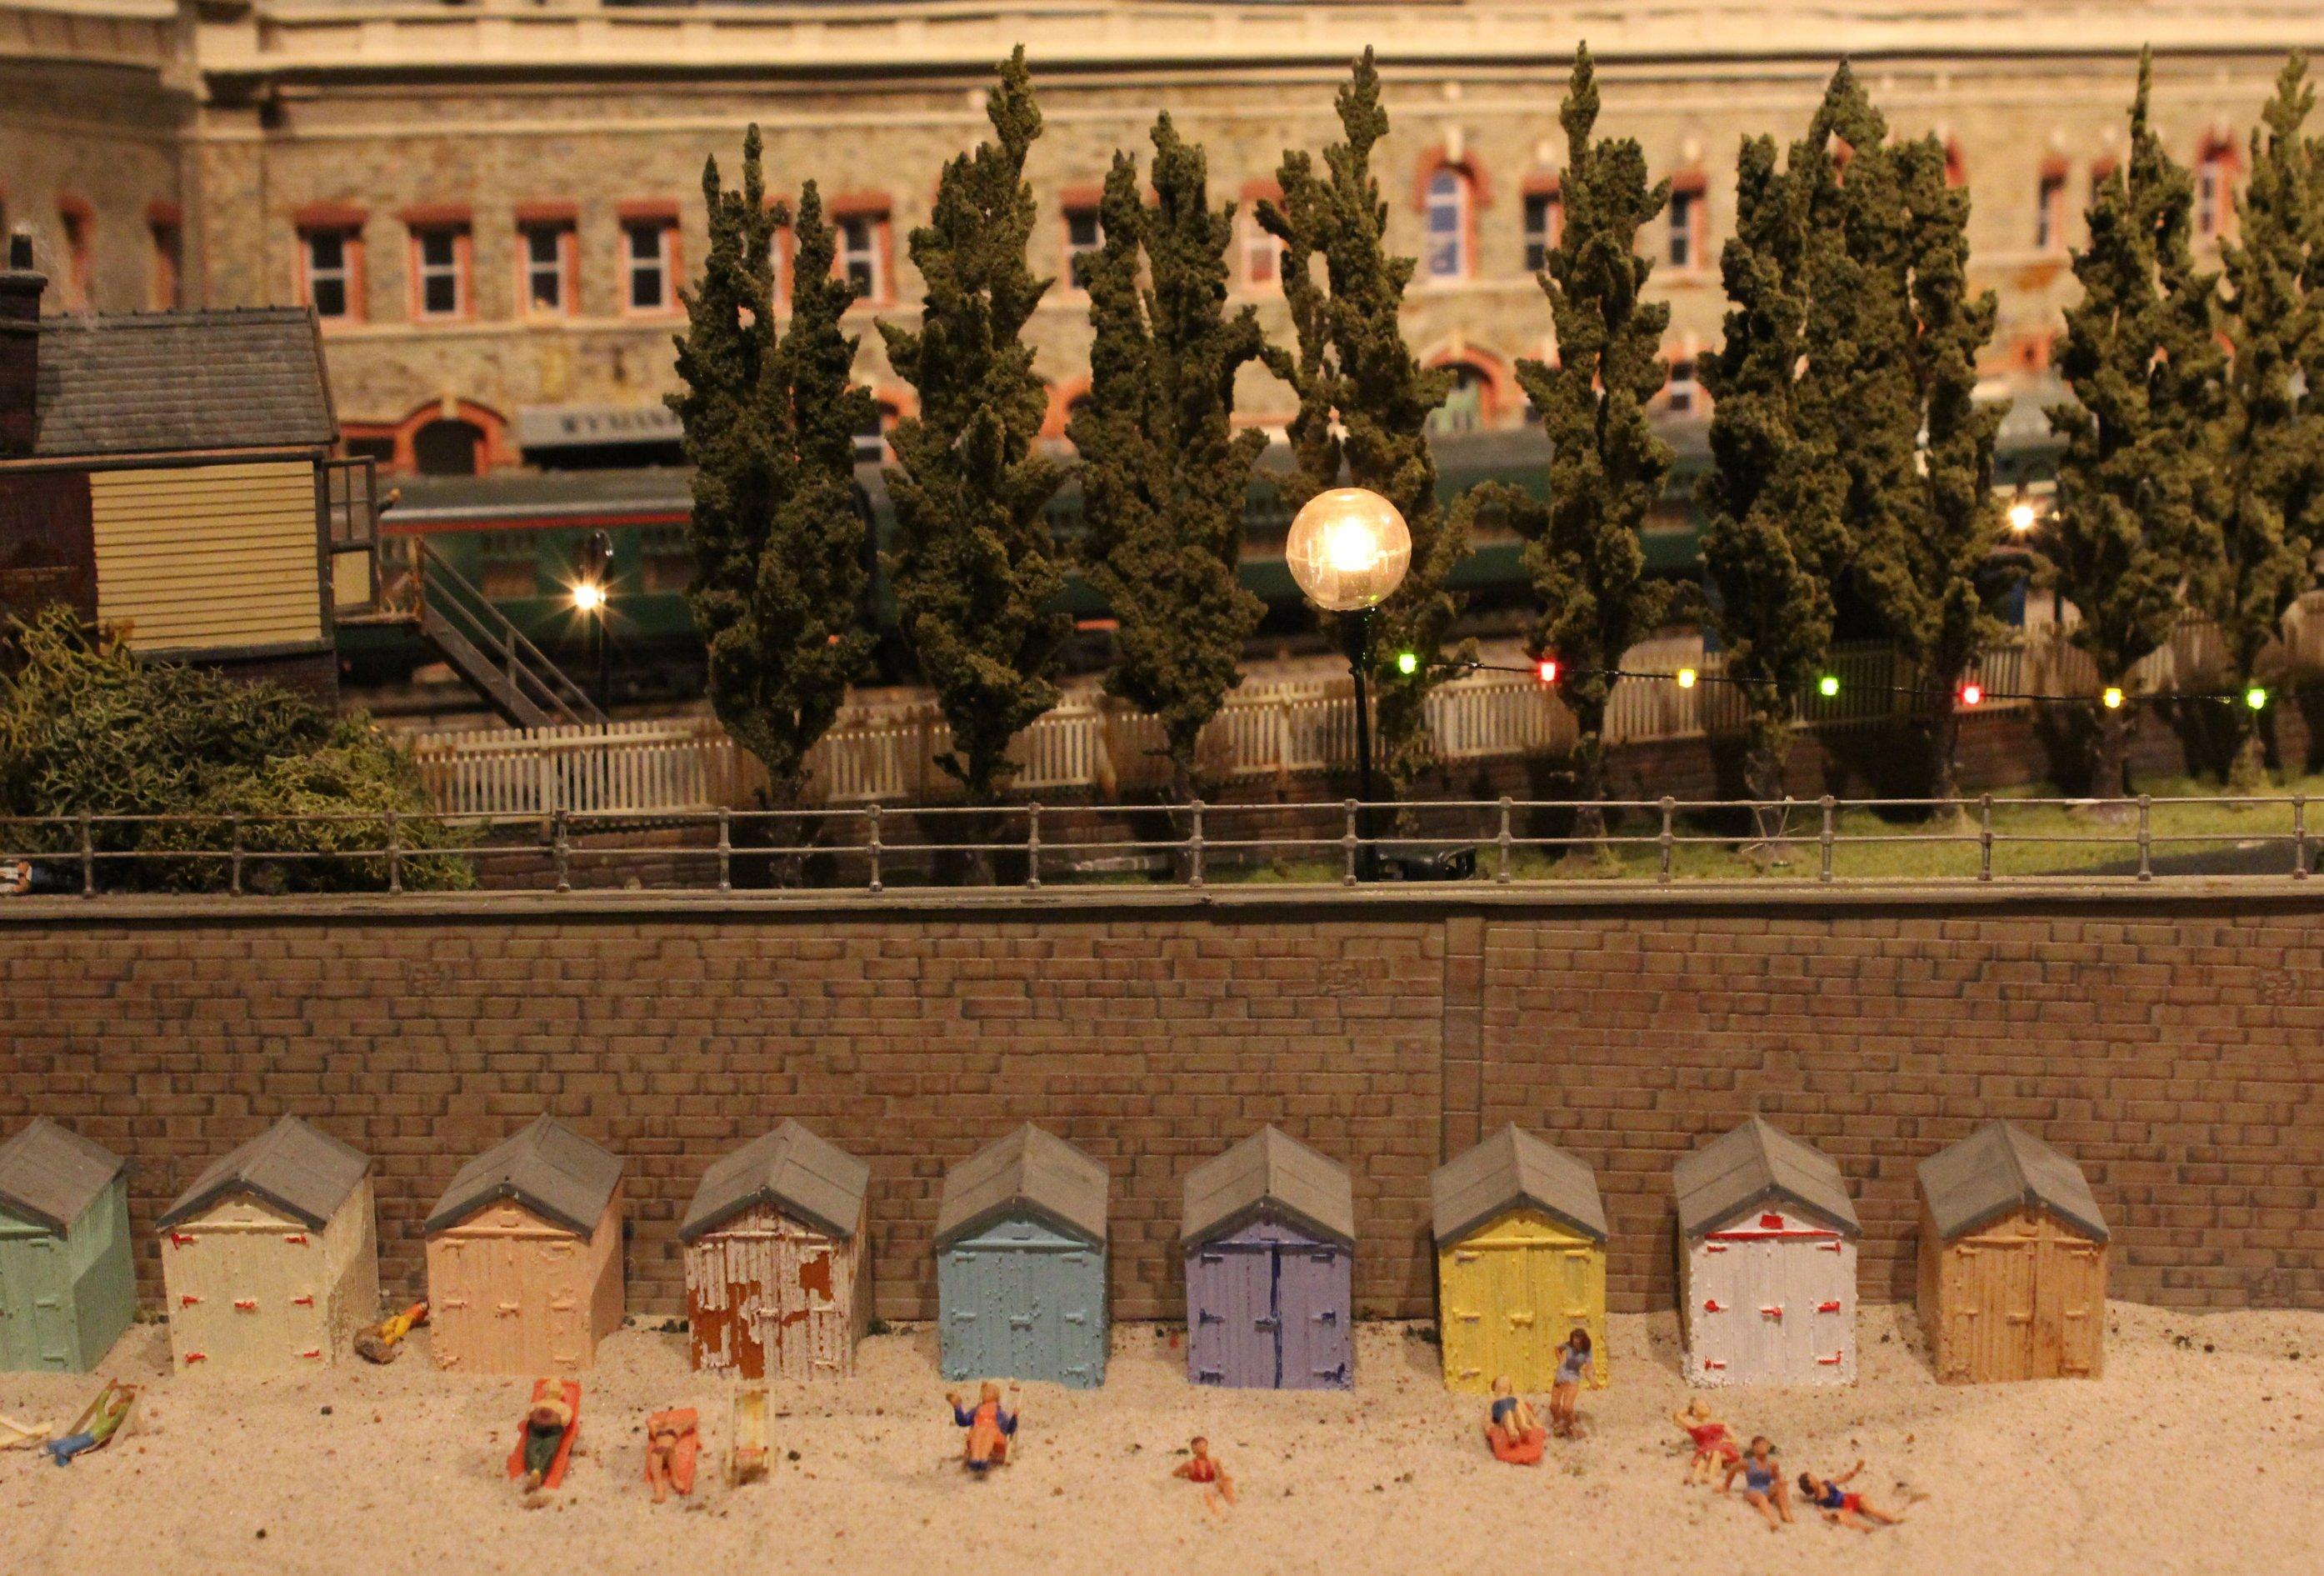 Trago mills 00 scale model railway 2013 17 beach huts for Model beach huts